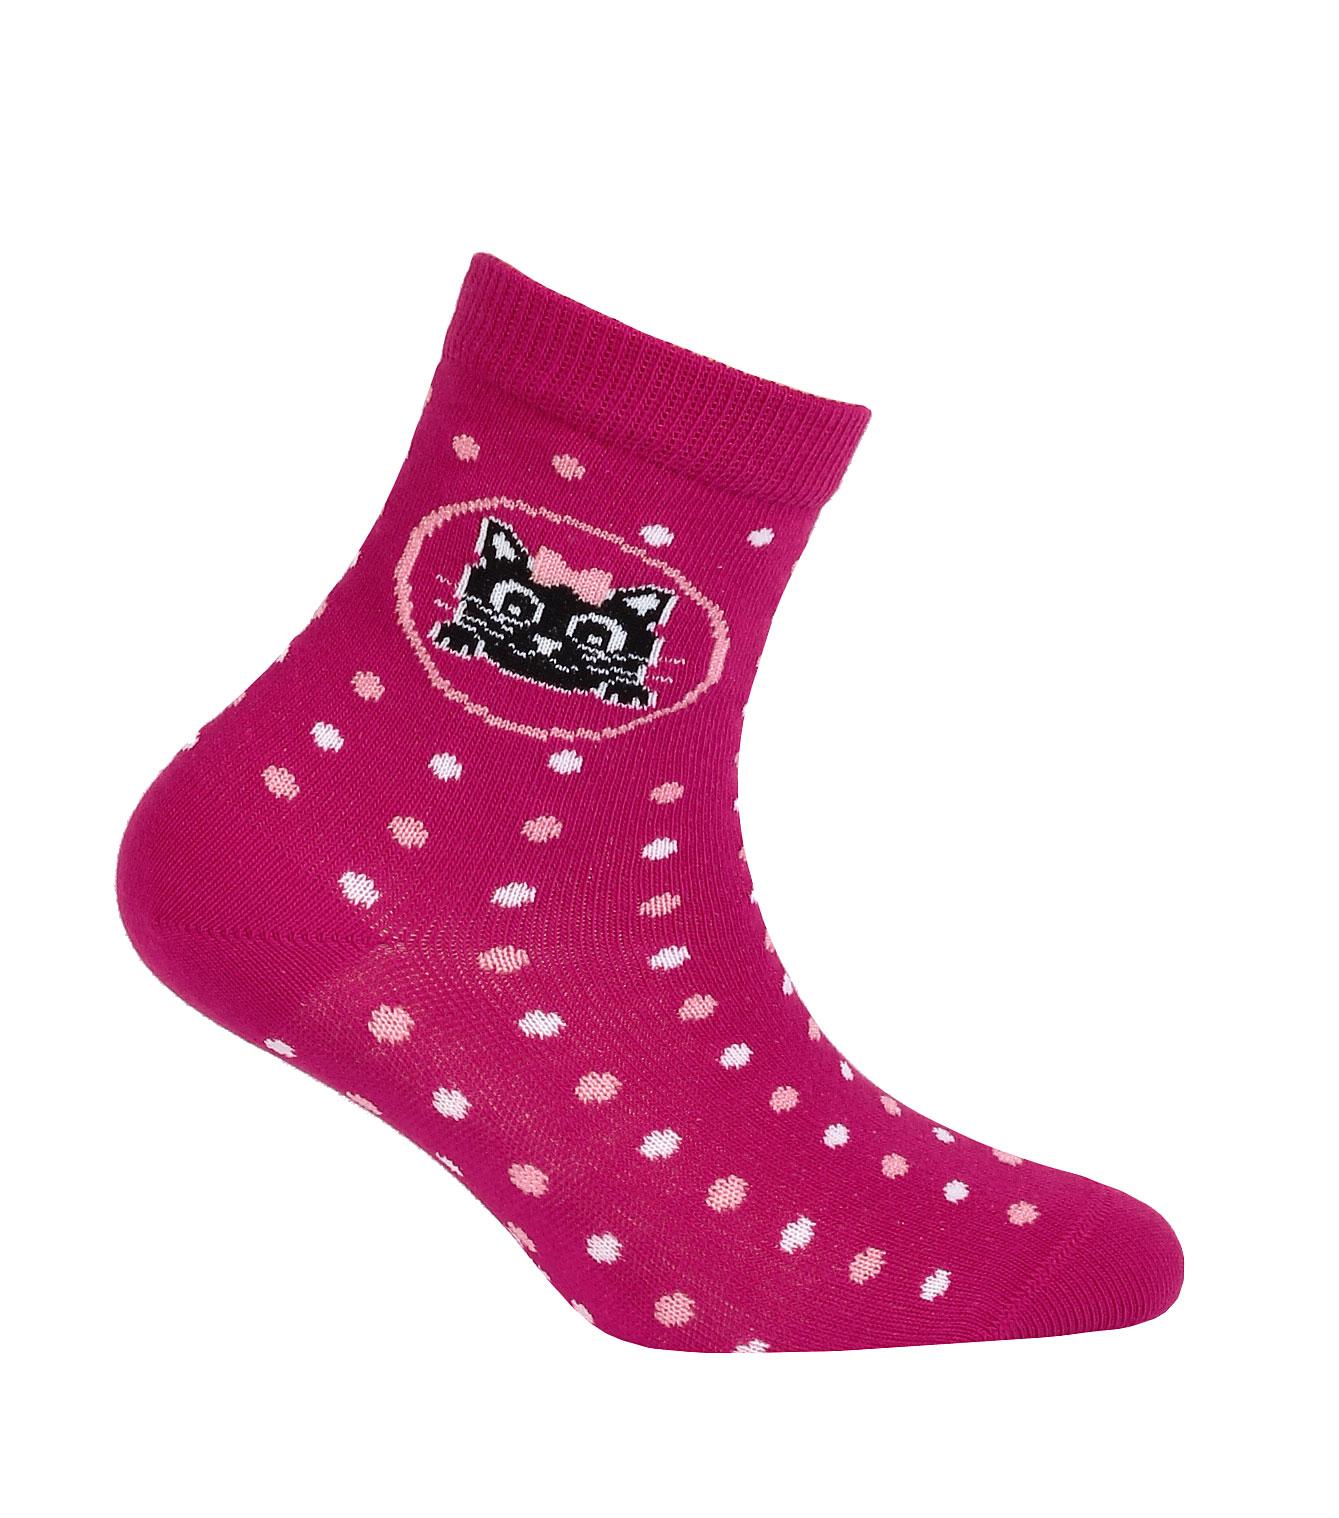 Vzorované dívčí ponožky GATTA KOŤÁTKO tmavě růžové Velikost  24-26 5f13b1ed1d